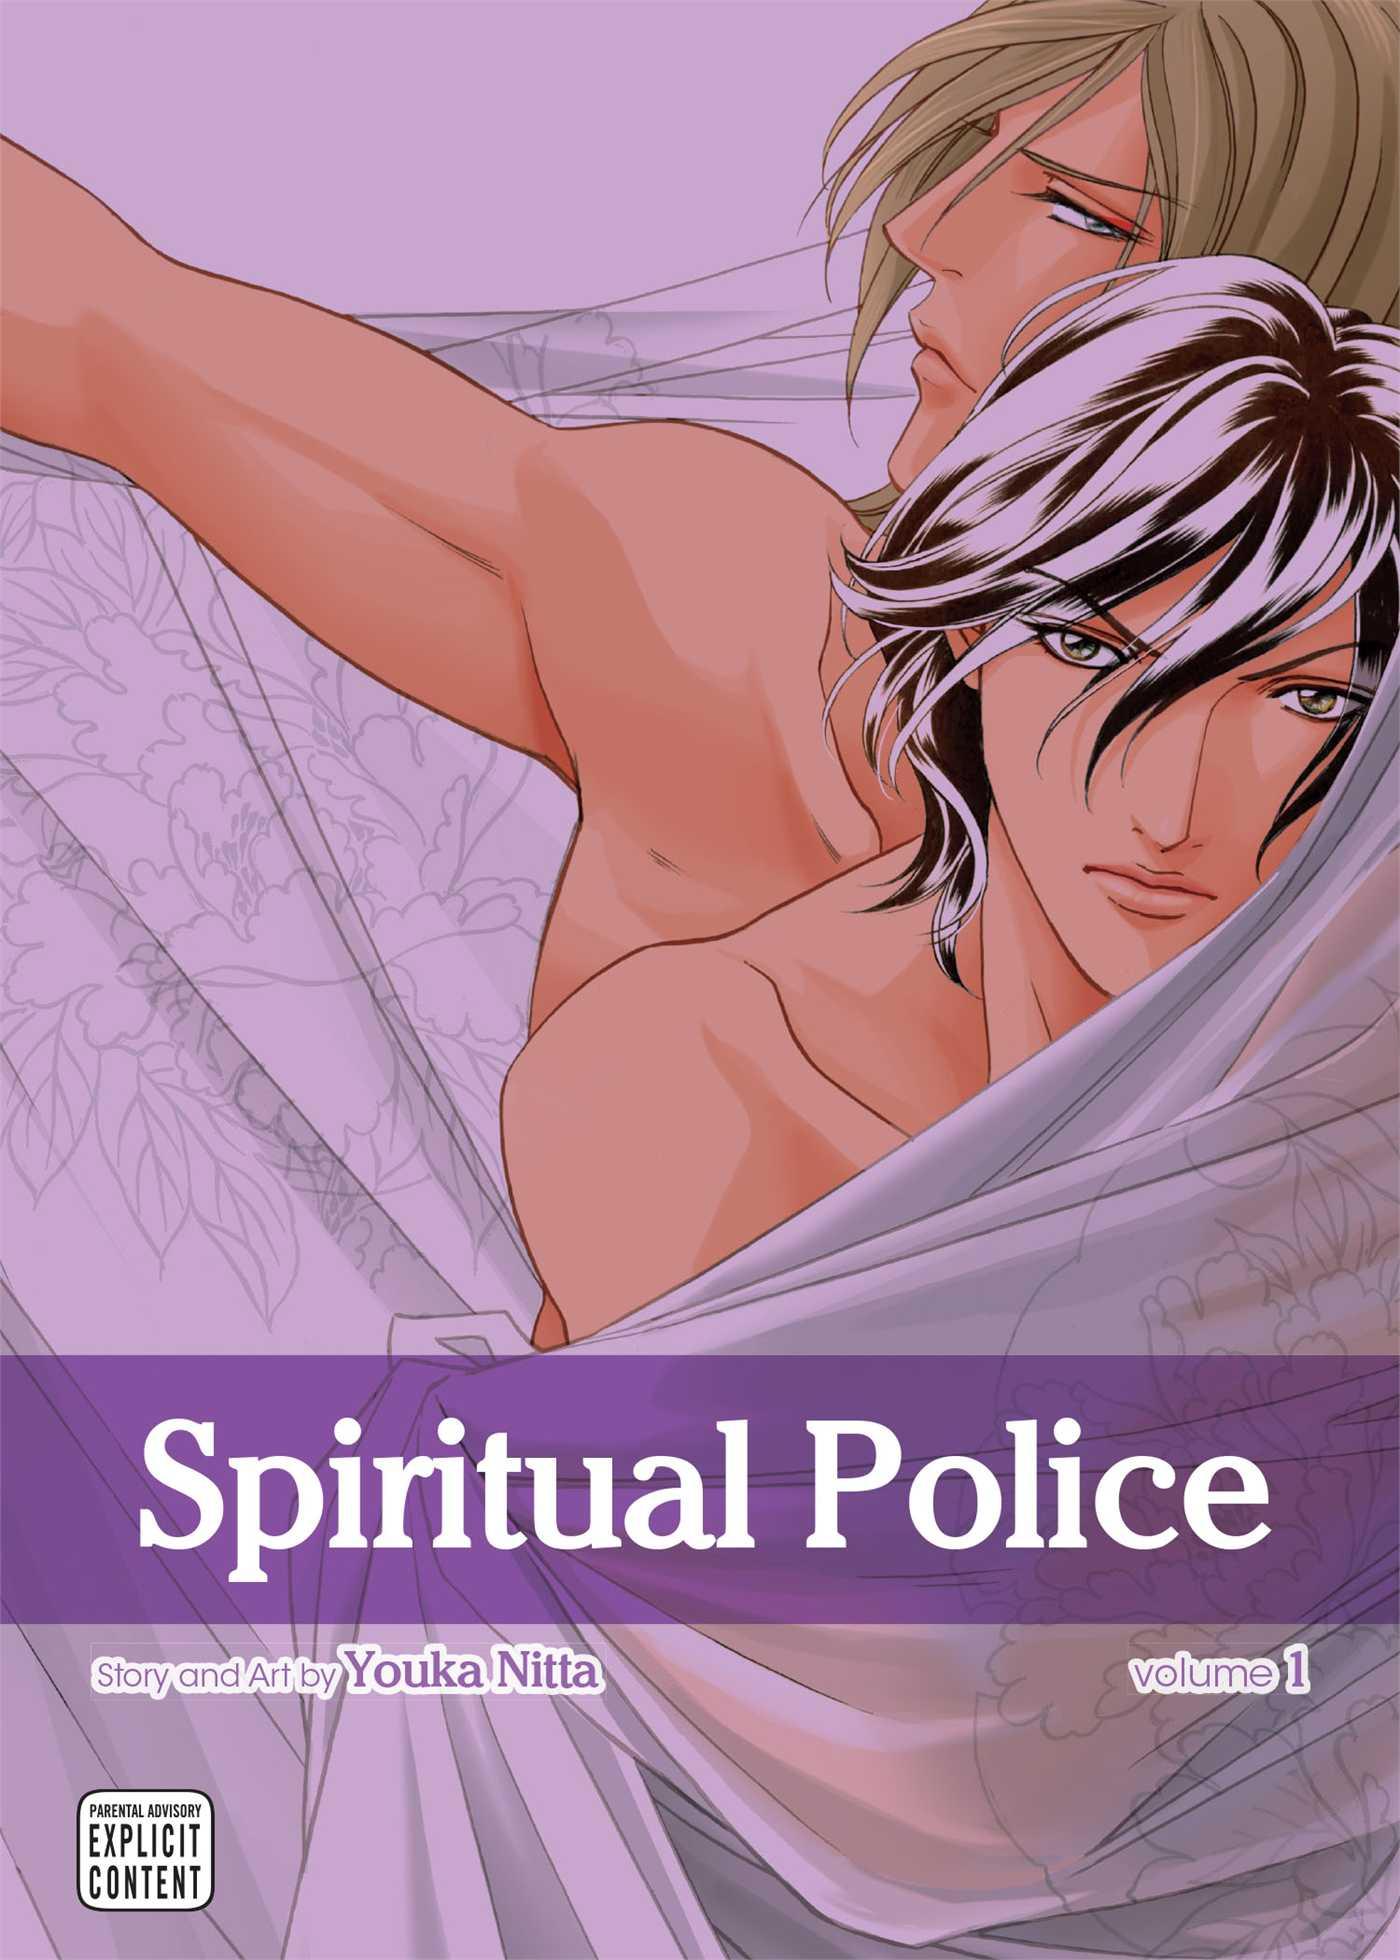 Spiritual police vol 1 9781421558417 hr